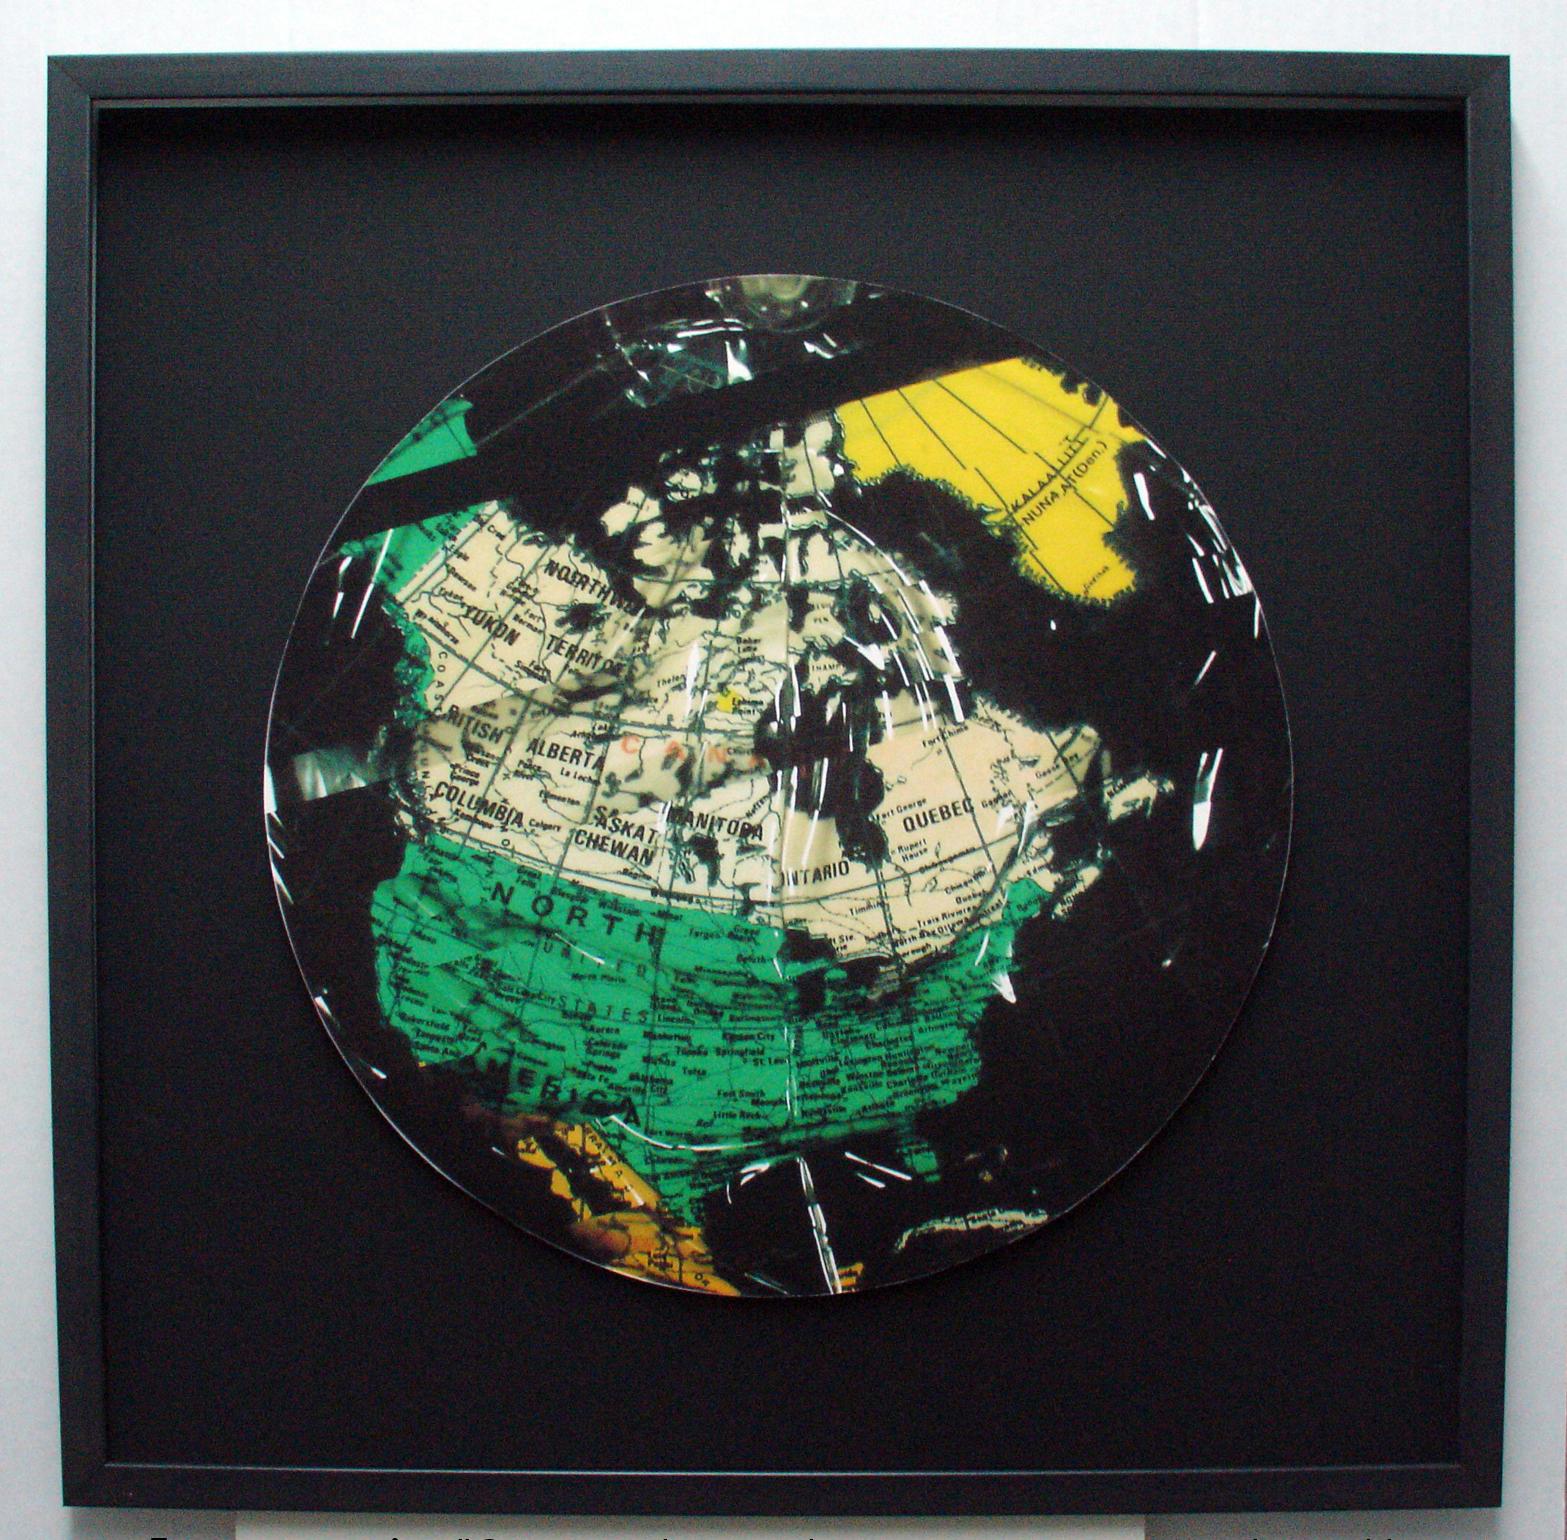 """En reconstruction III"", 2008 Digital rework of 1993  Bubble Jet  photocopy"